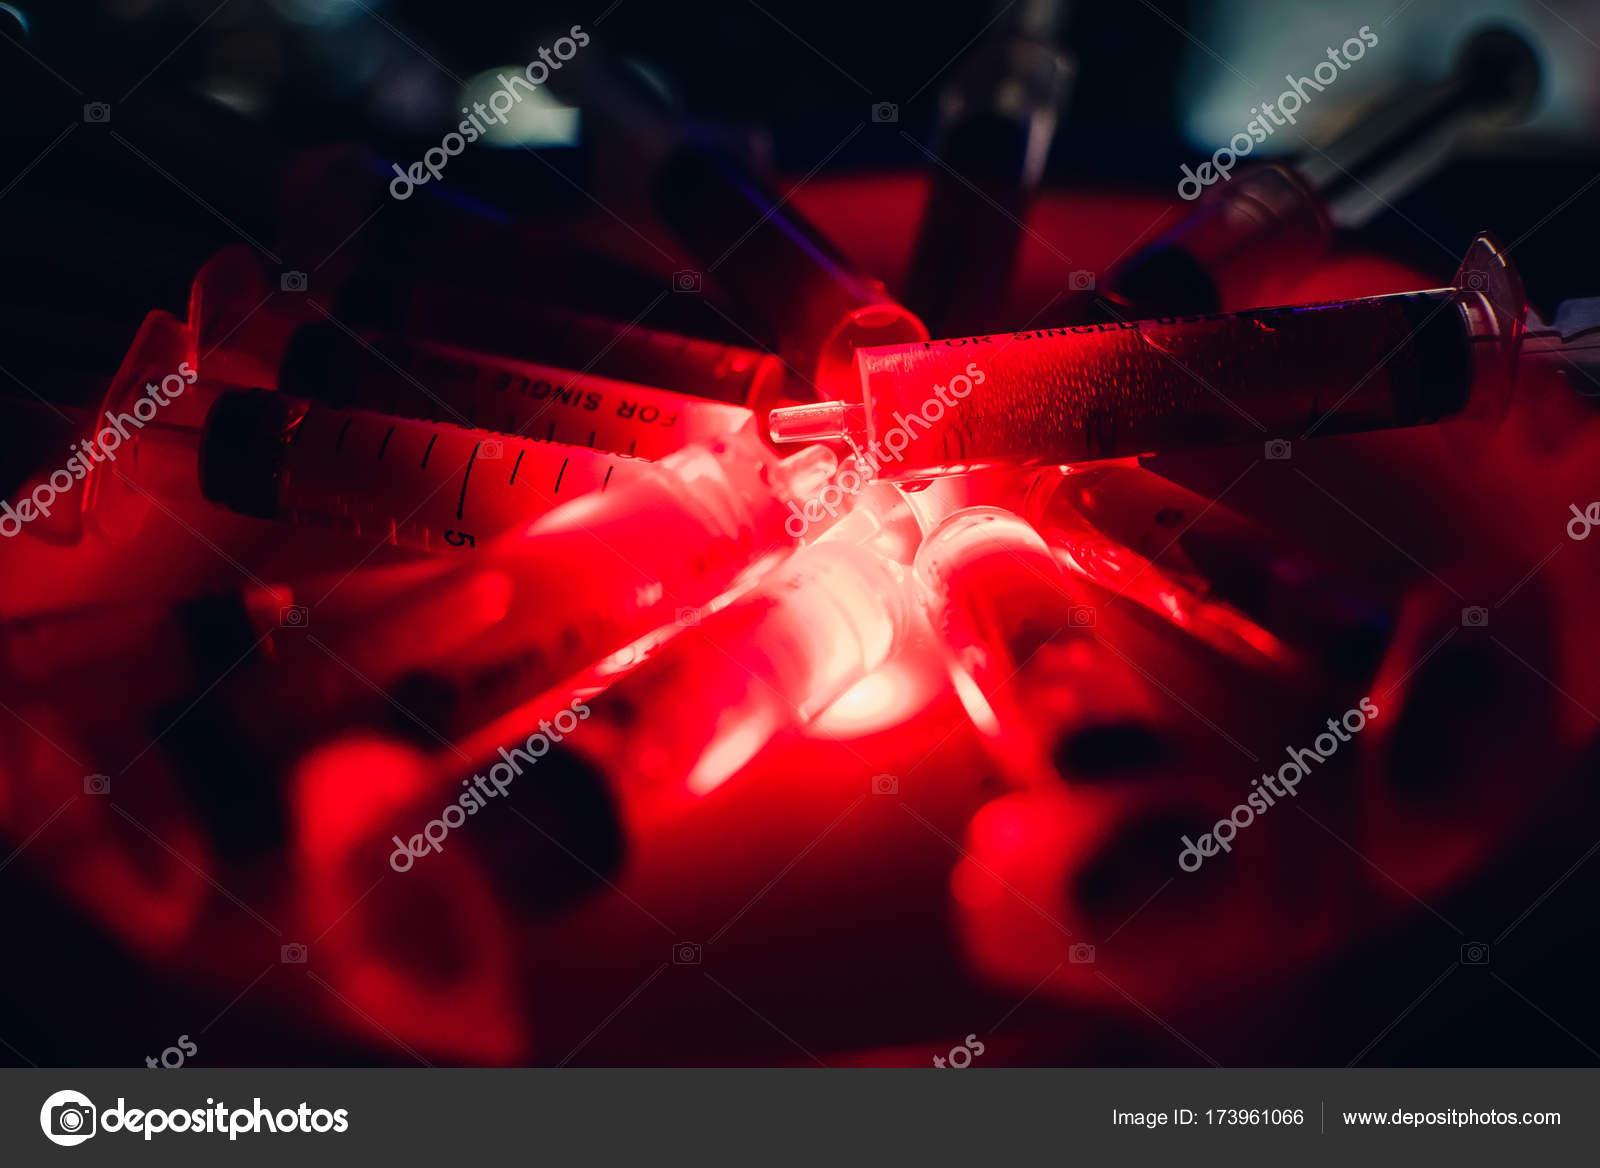 Siringhe con creatinina sangue halloween orribile su uno sfondo